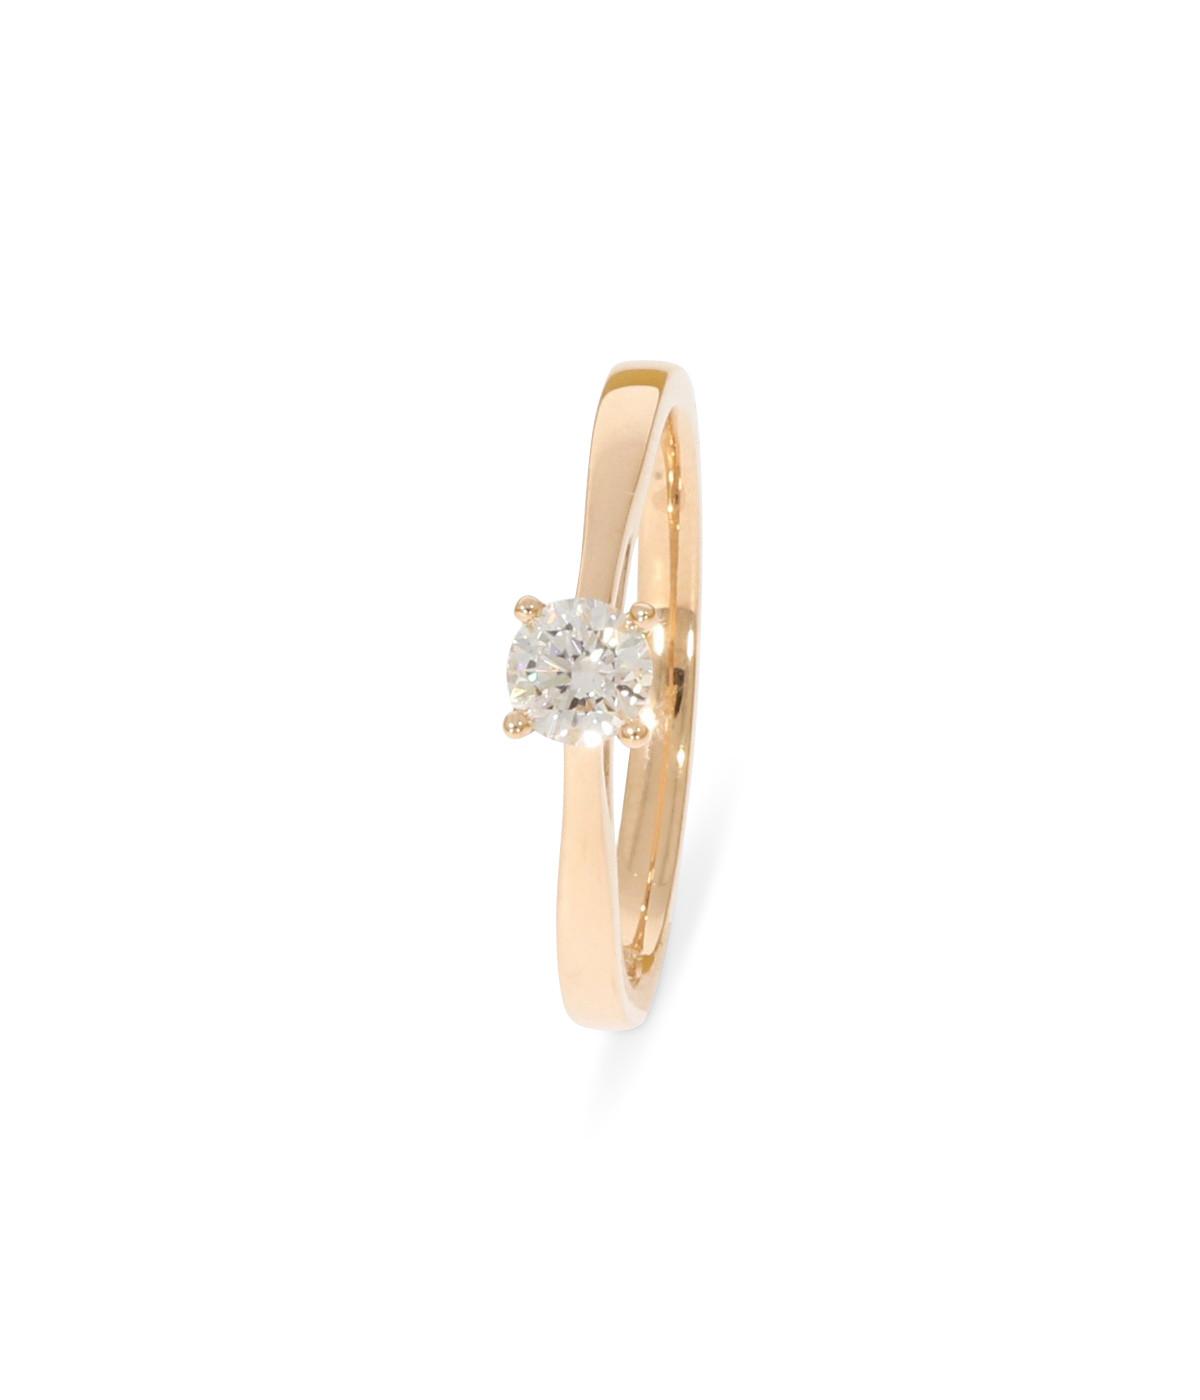 Verlobungsring-rosegold-18k-brillant